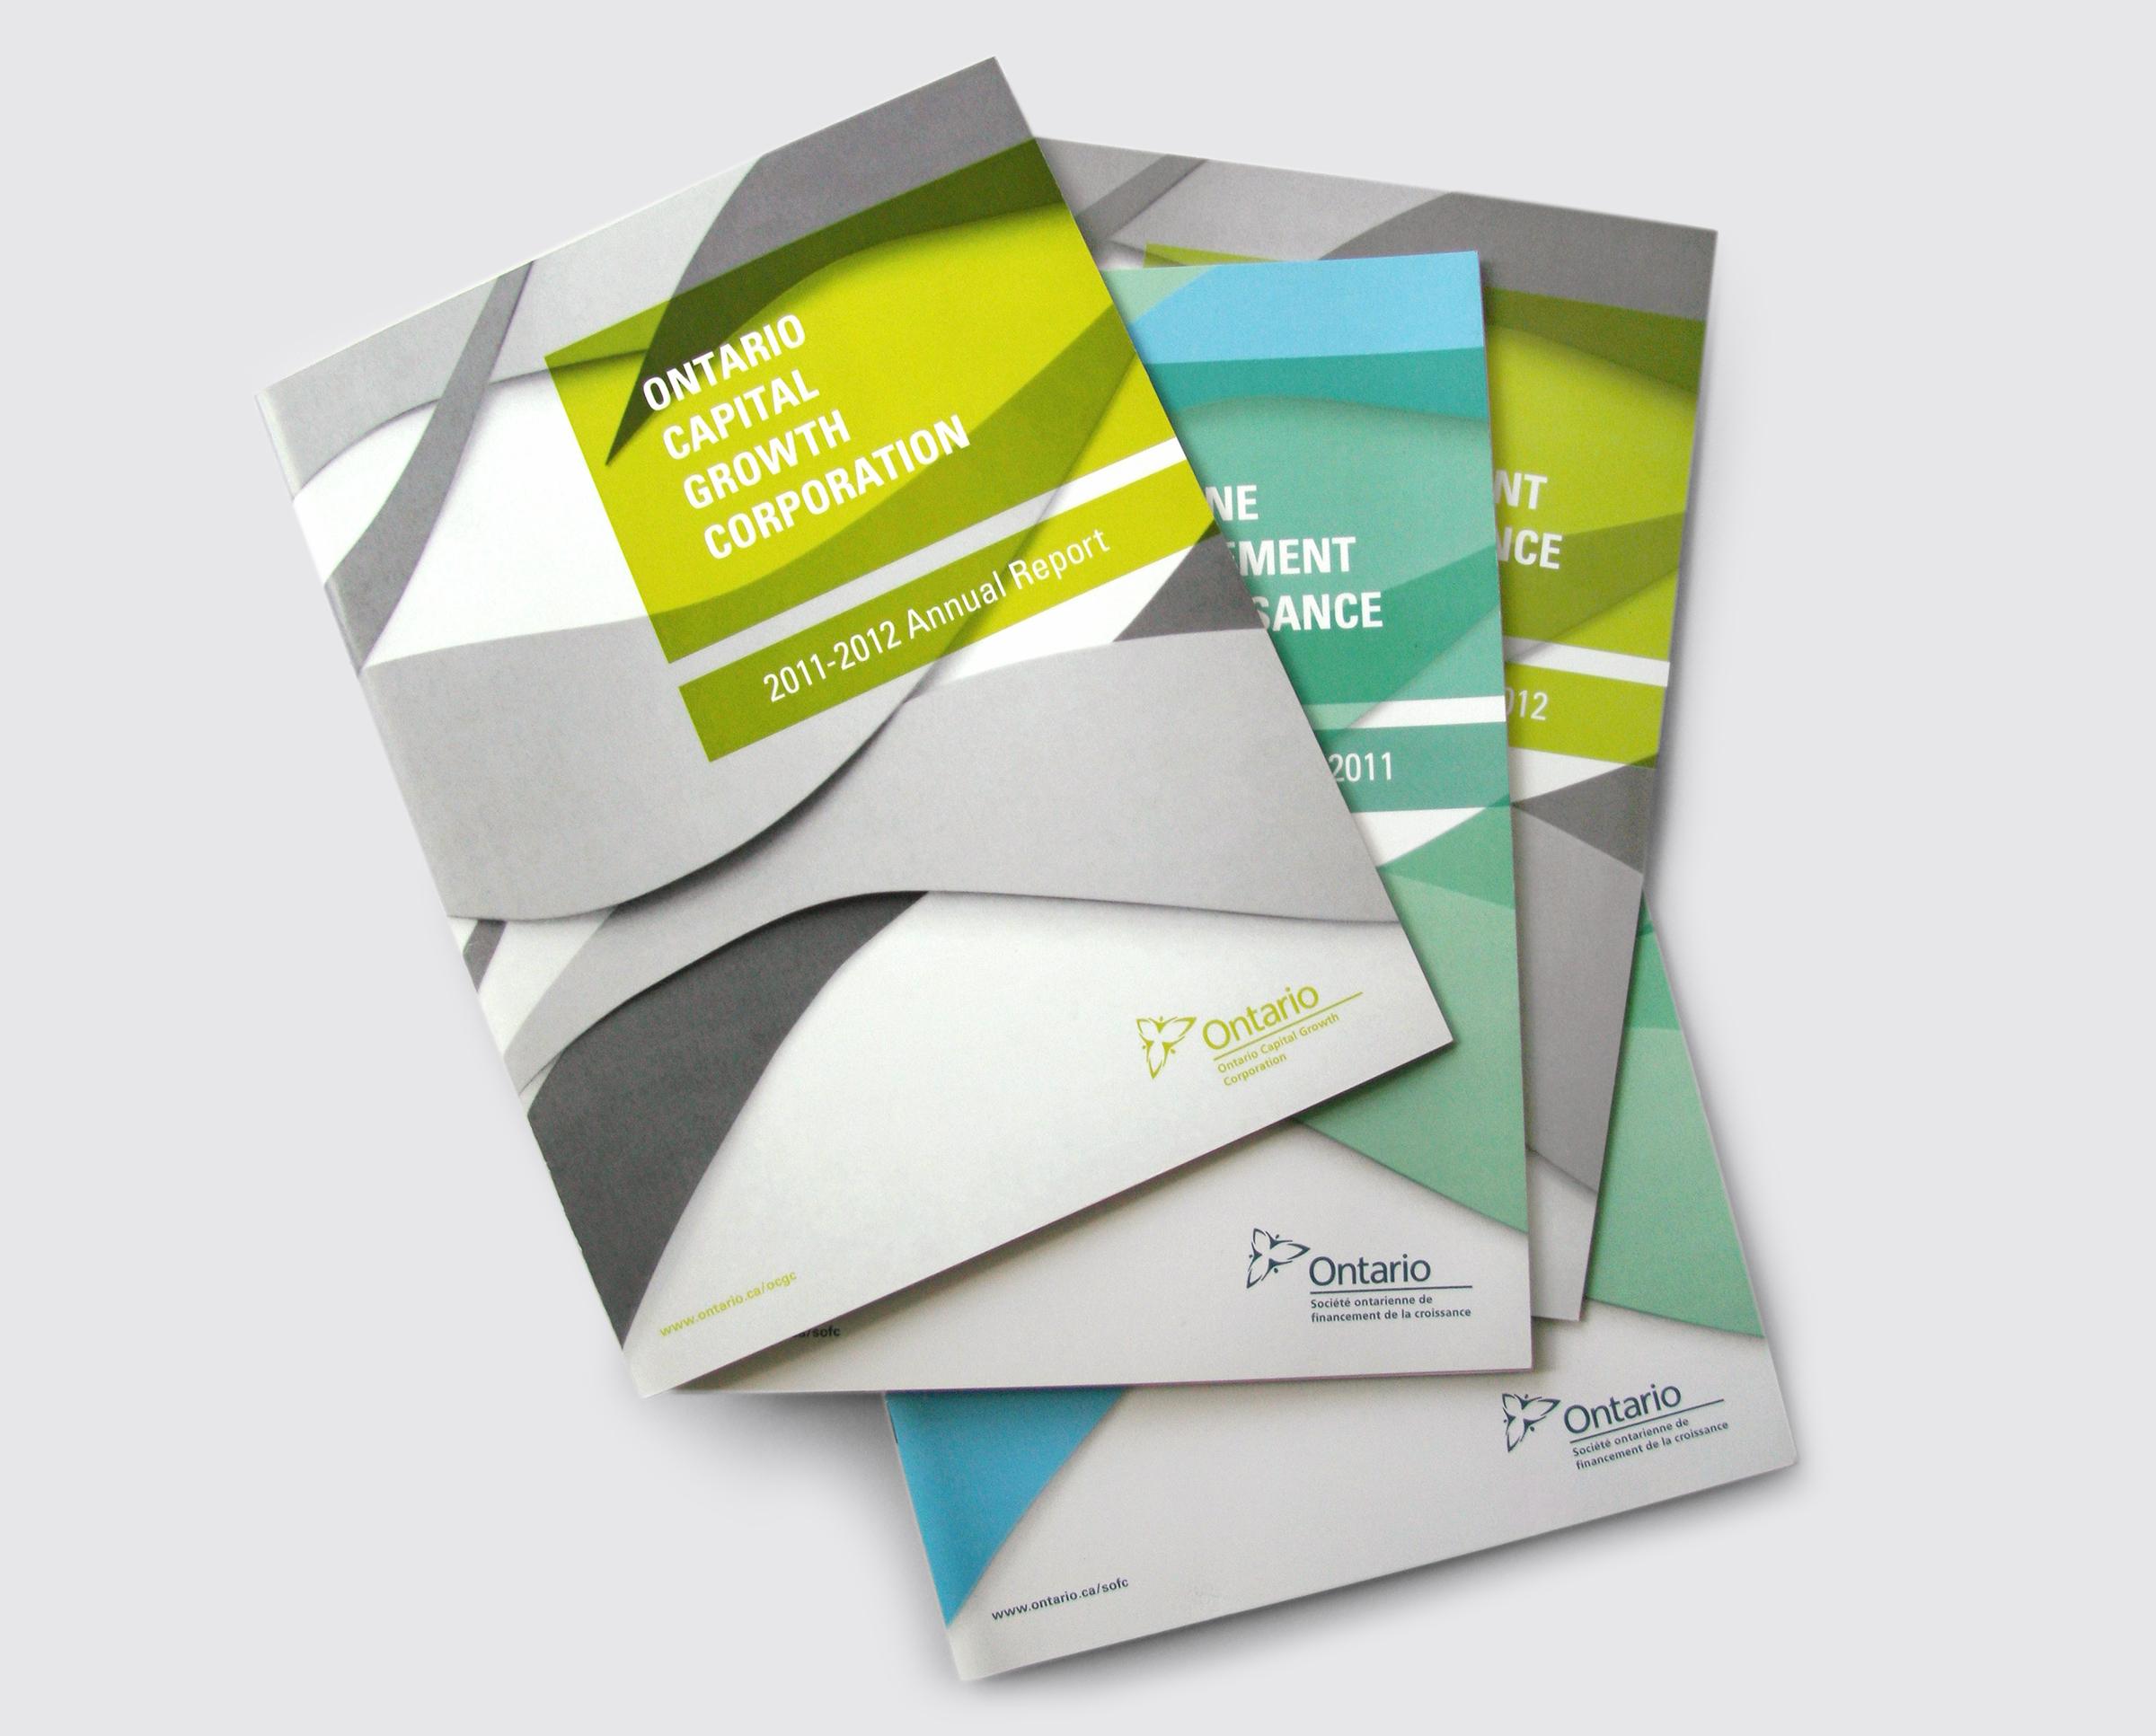 2010/2011 & 2011/2012 Annual Report